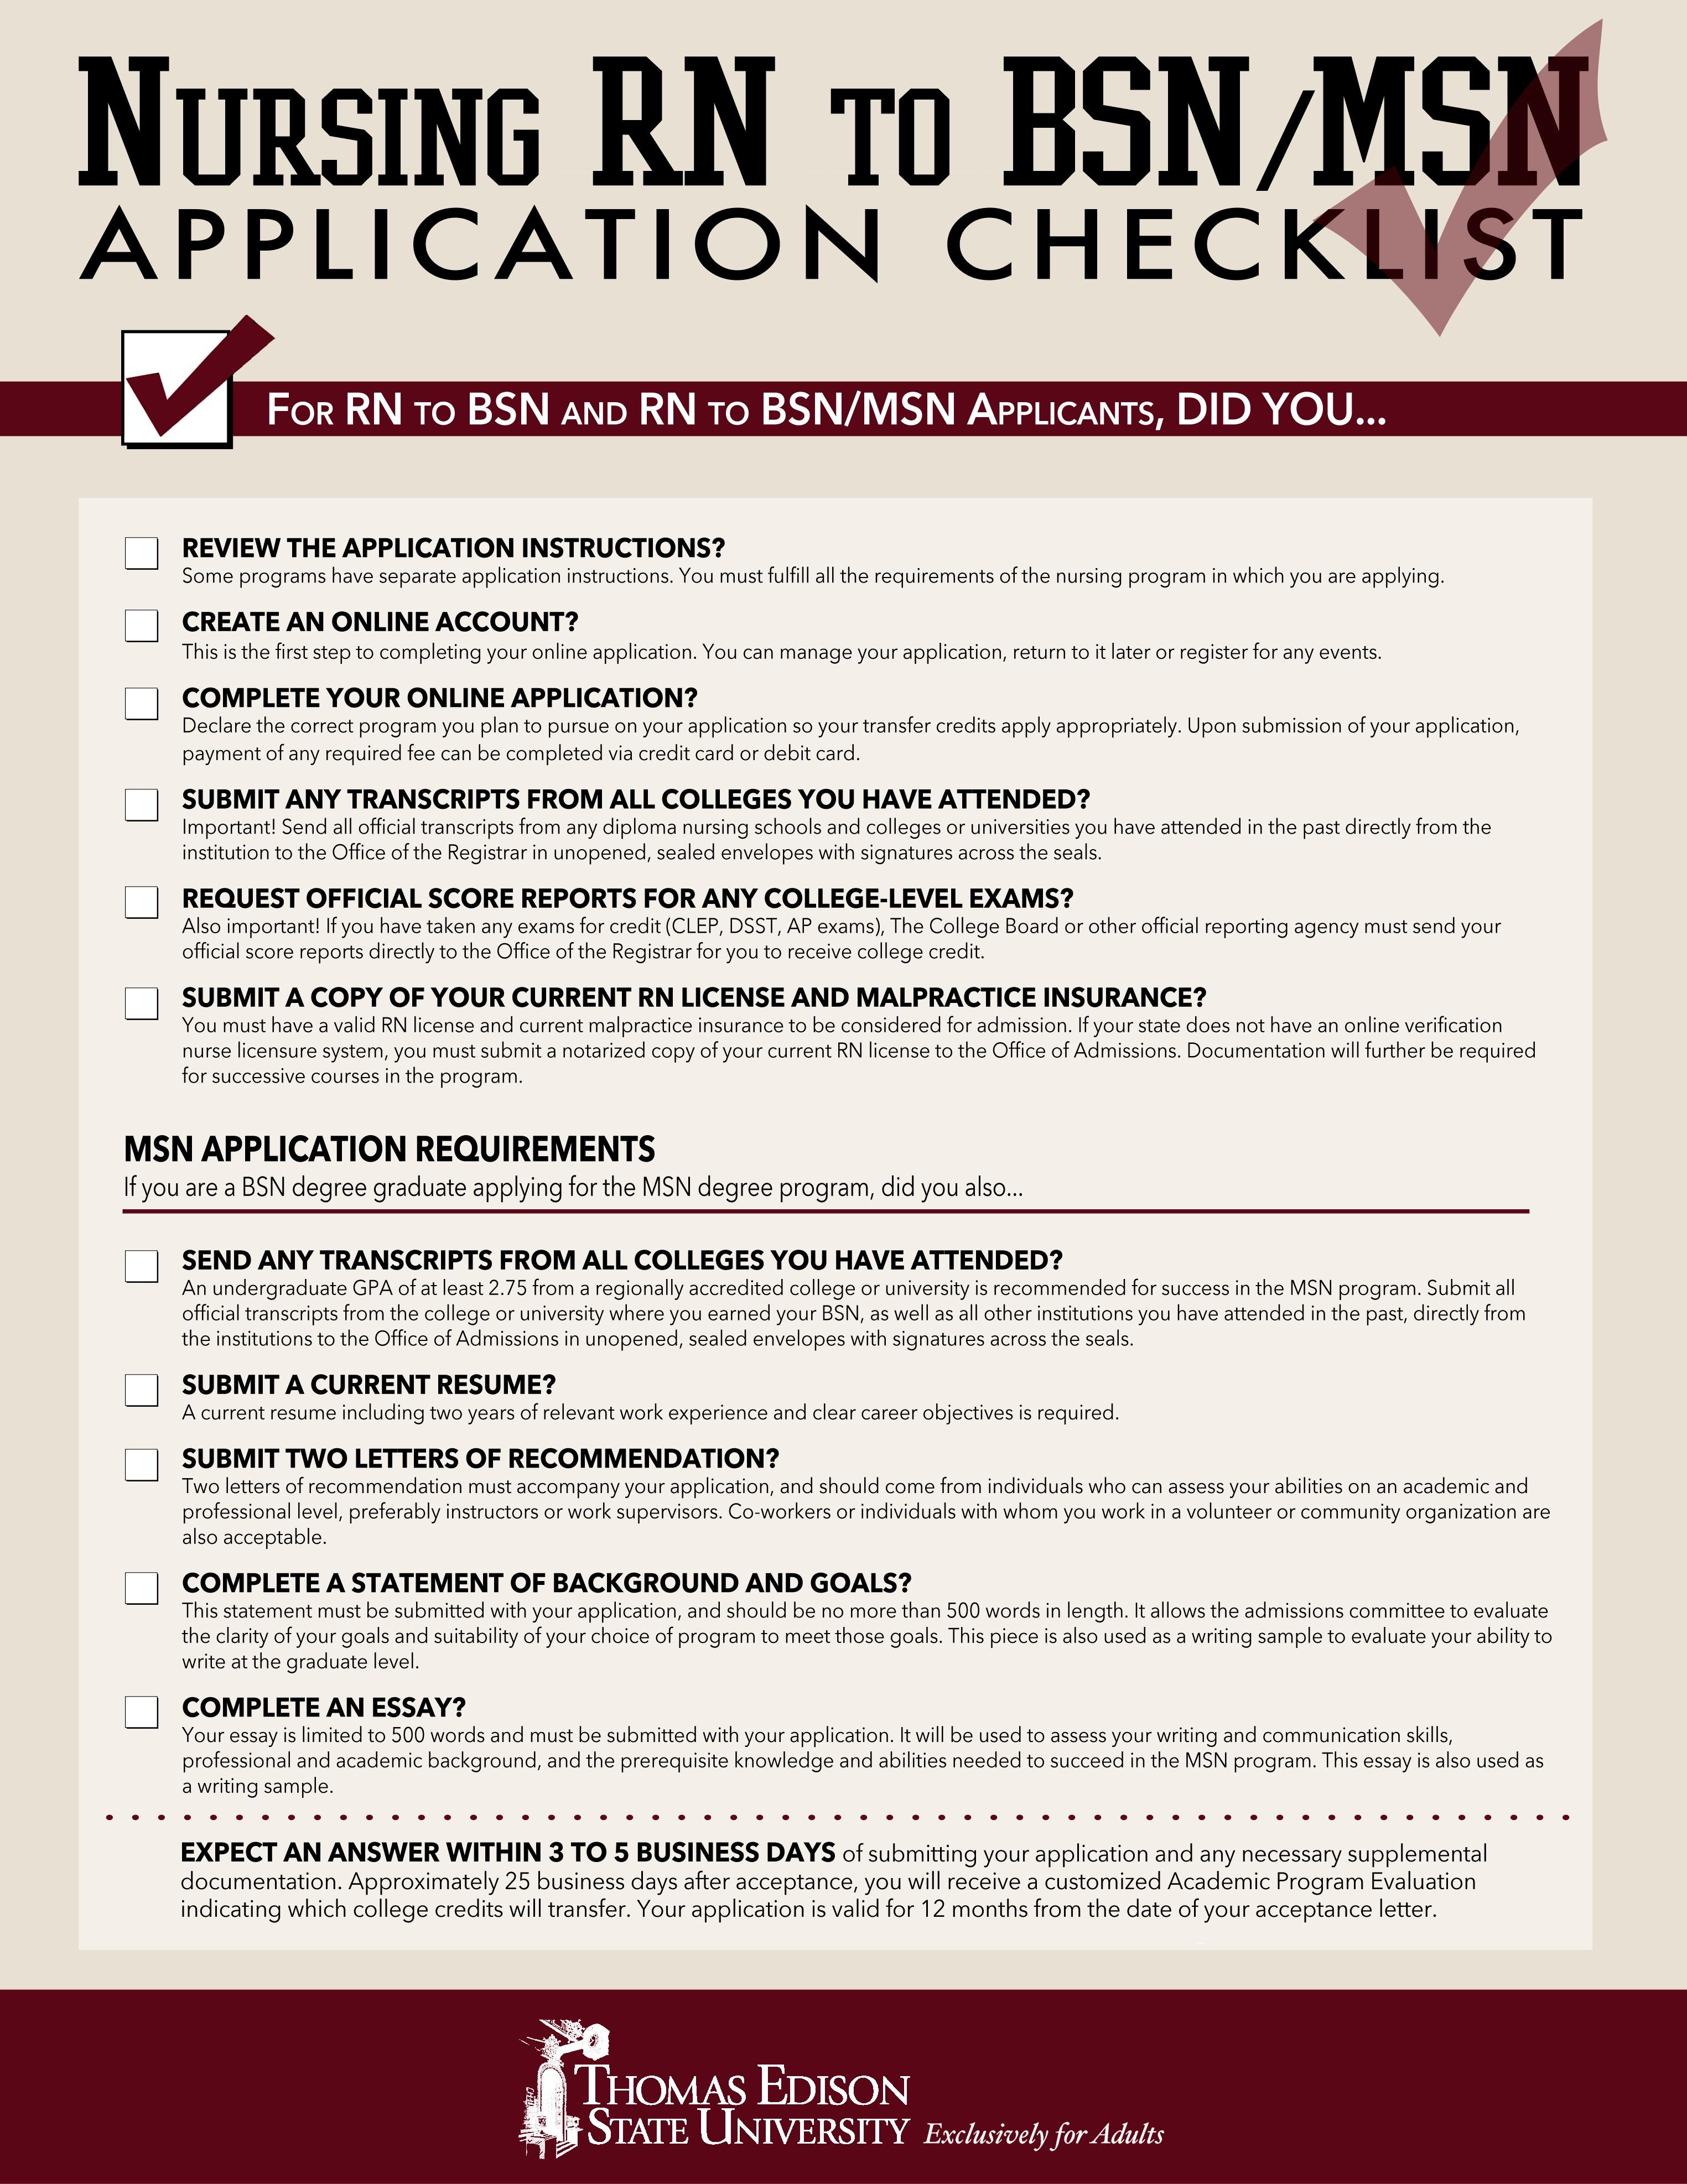 Thomas_Edison_State_University_RN_to_BSN_to_MSN_application_checklist